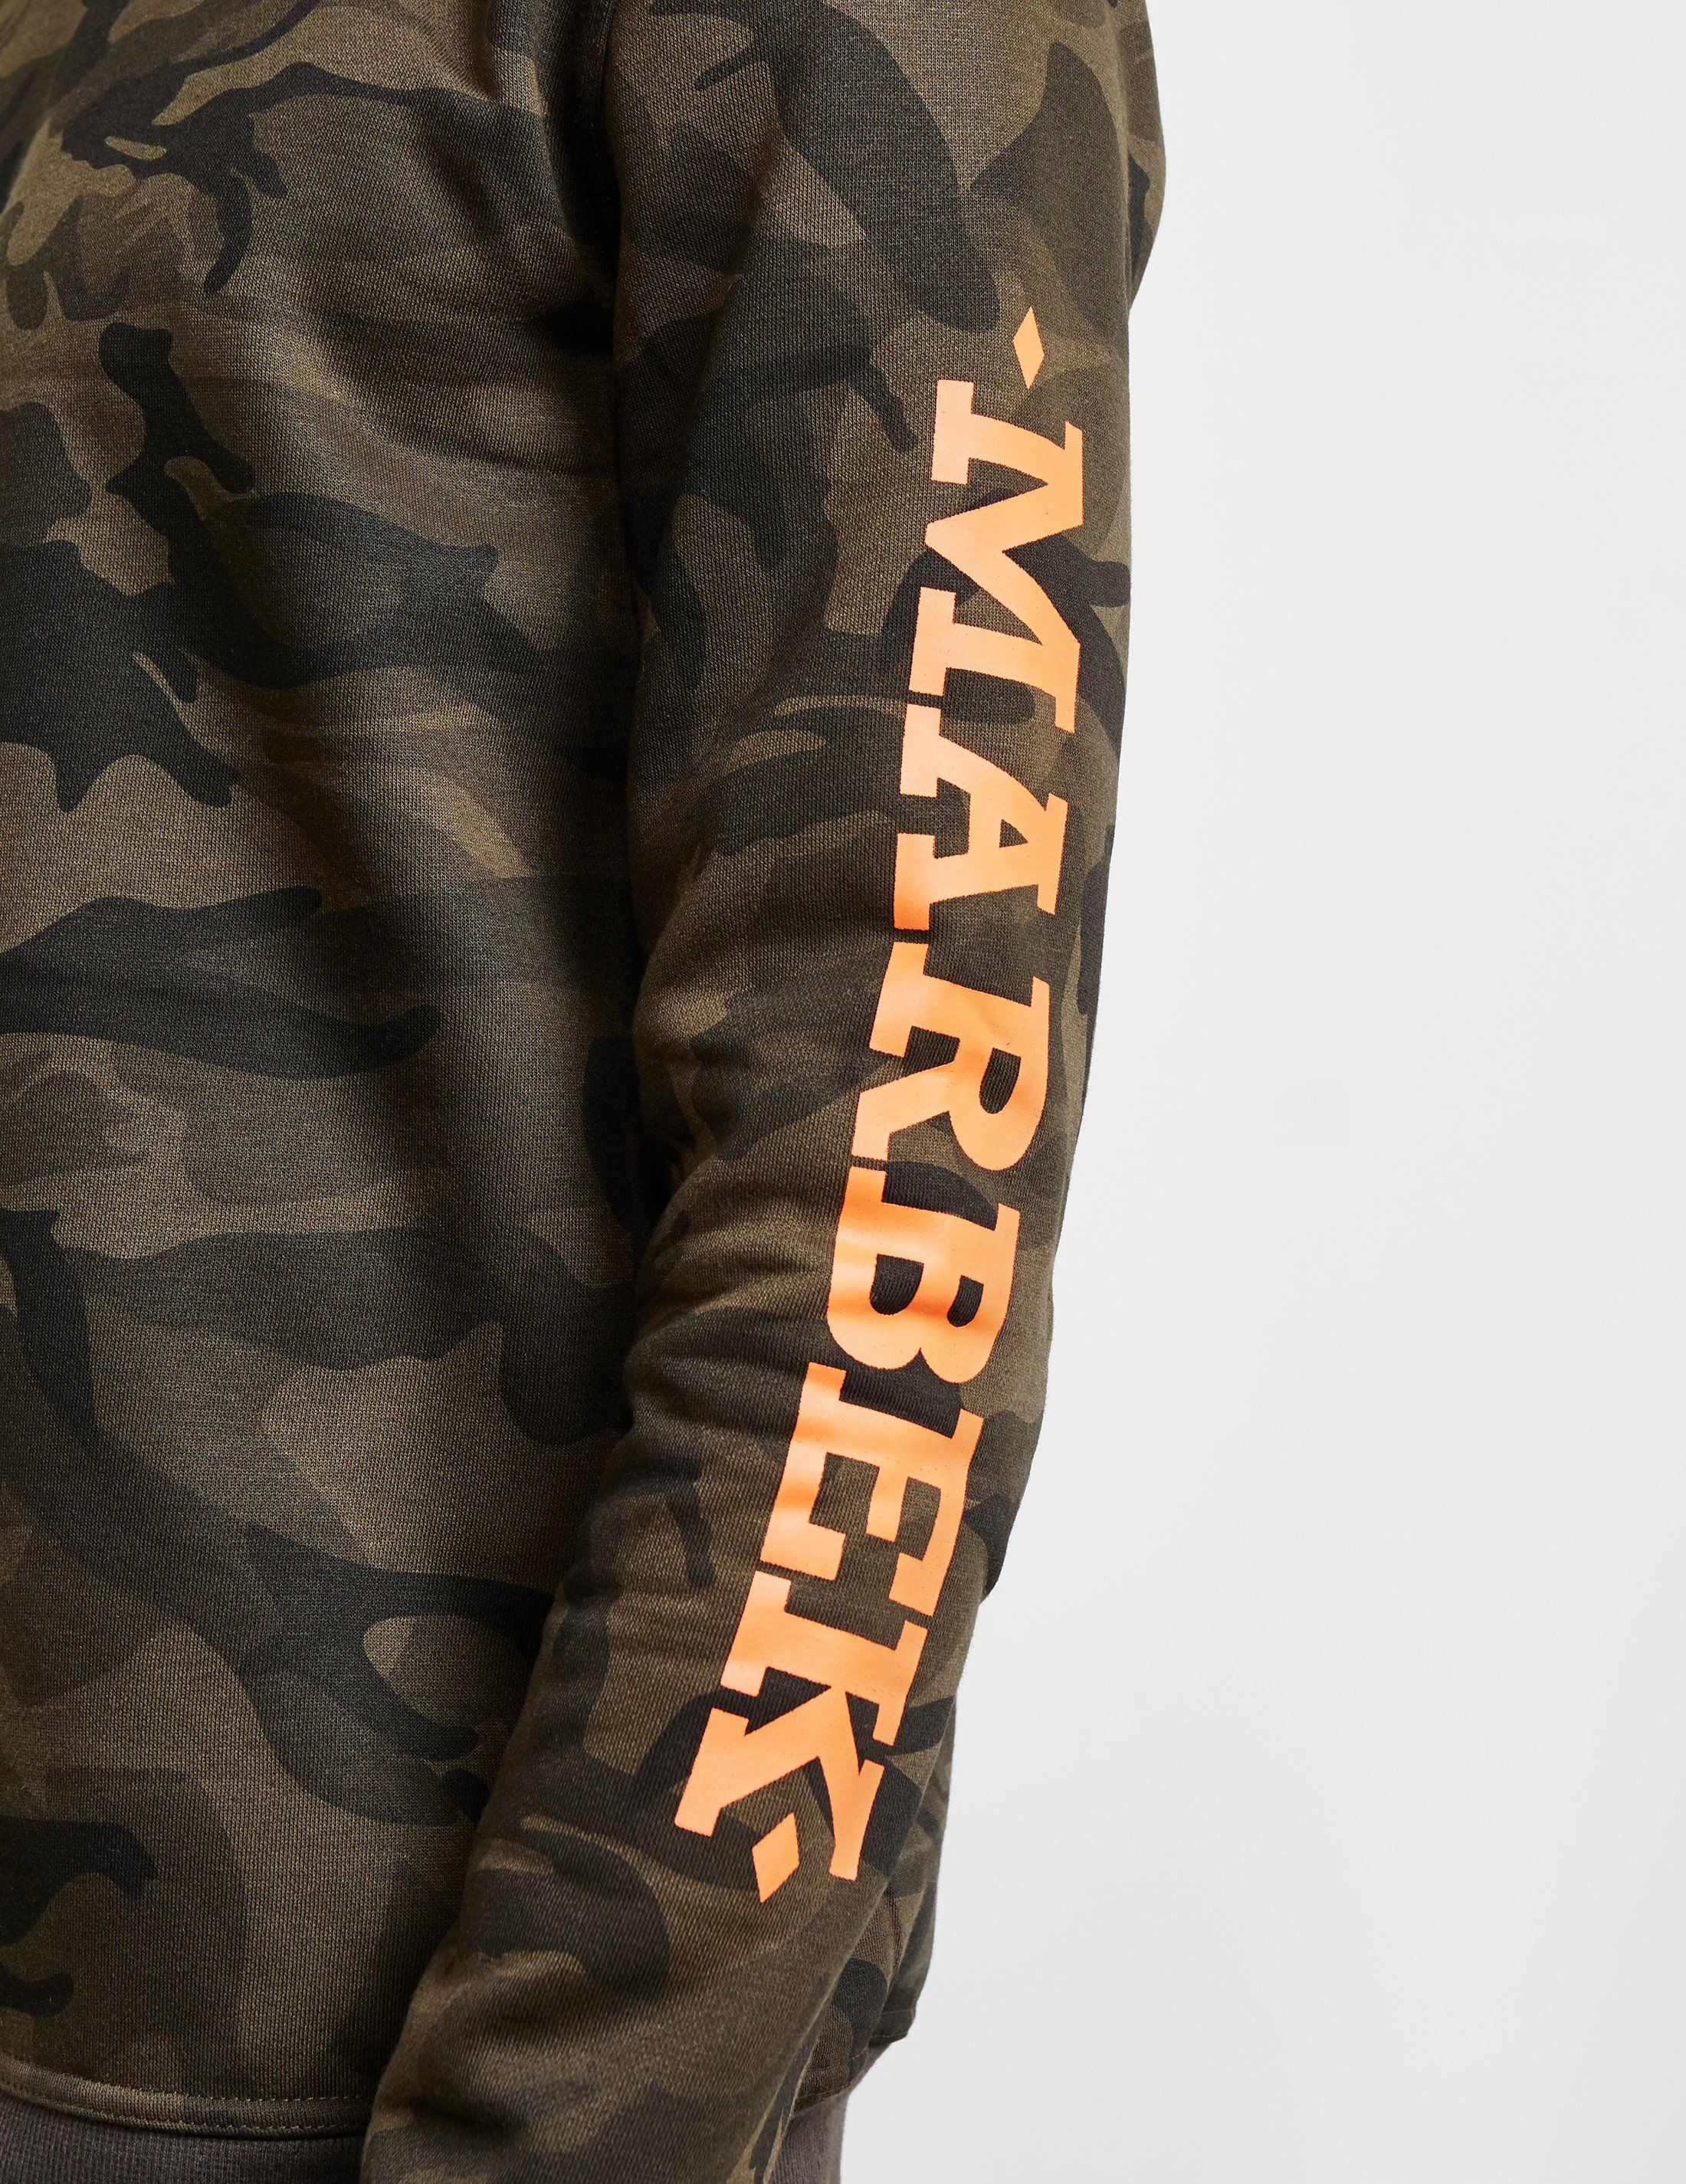 Marbek Camouflage Sweatshirt - Exclusive